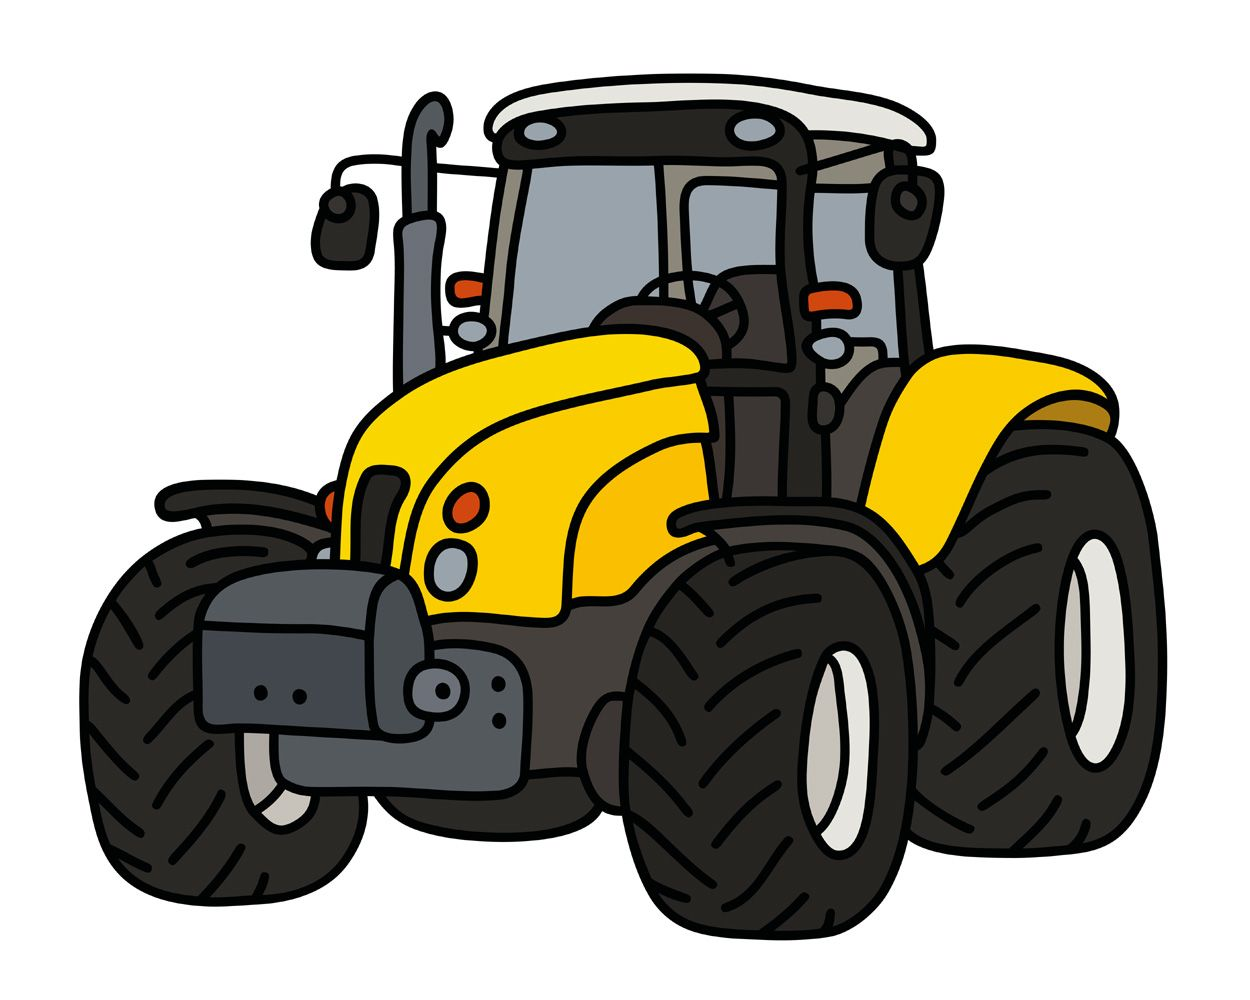 The Yellow Tractor Trator Desenho Trator Aniversario De Trator